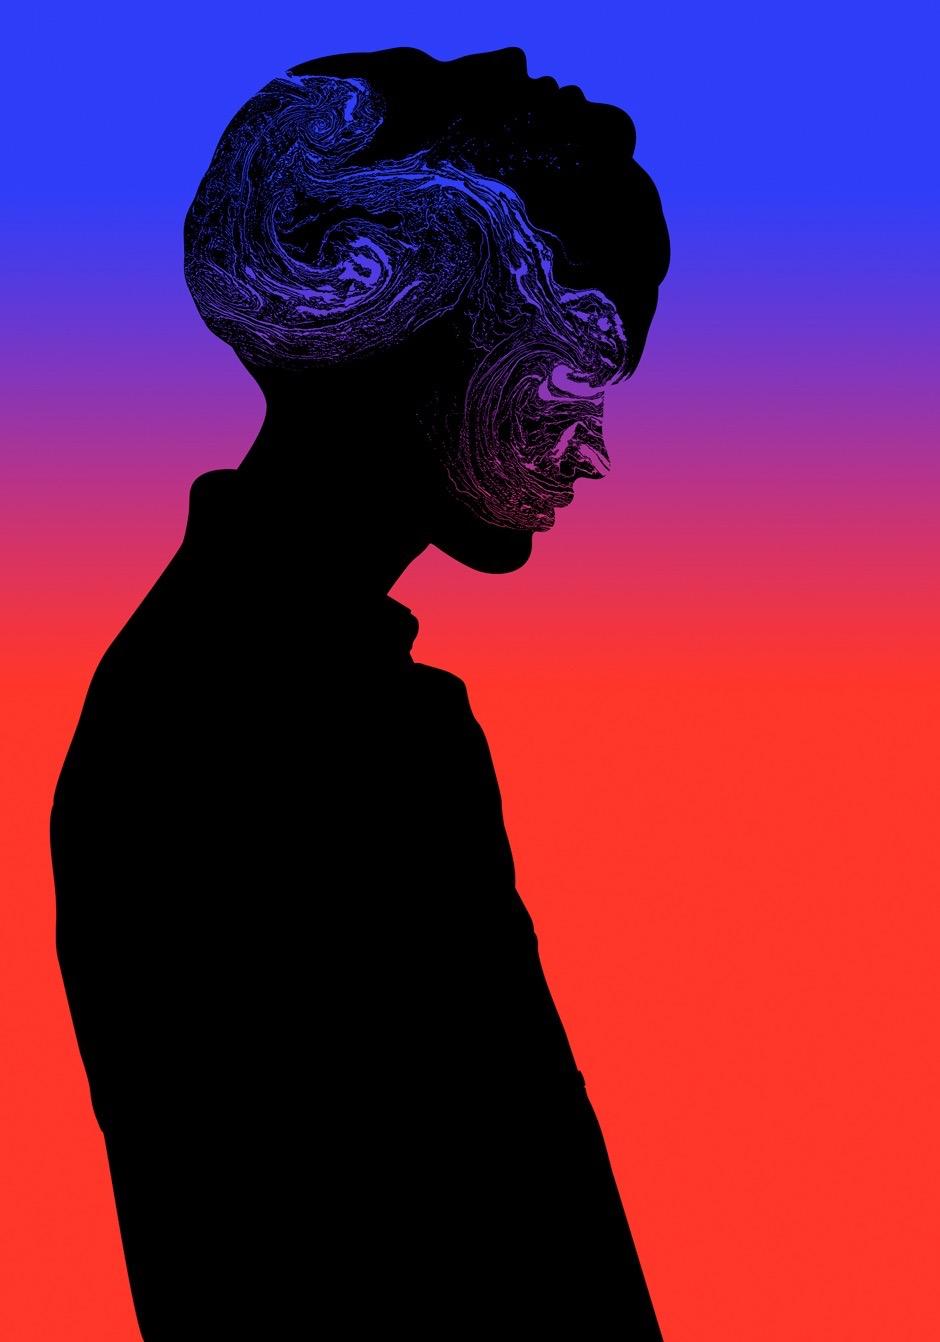 illustration, illustrations, illustrator, illustrators, woman, women, stand, standing, gradient, swirl, swirling, texture